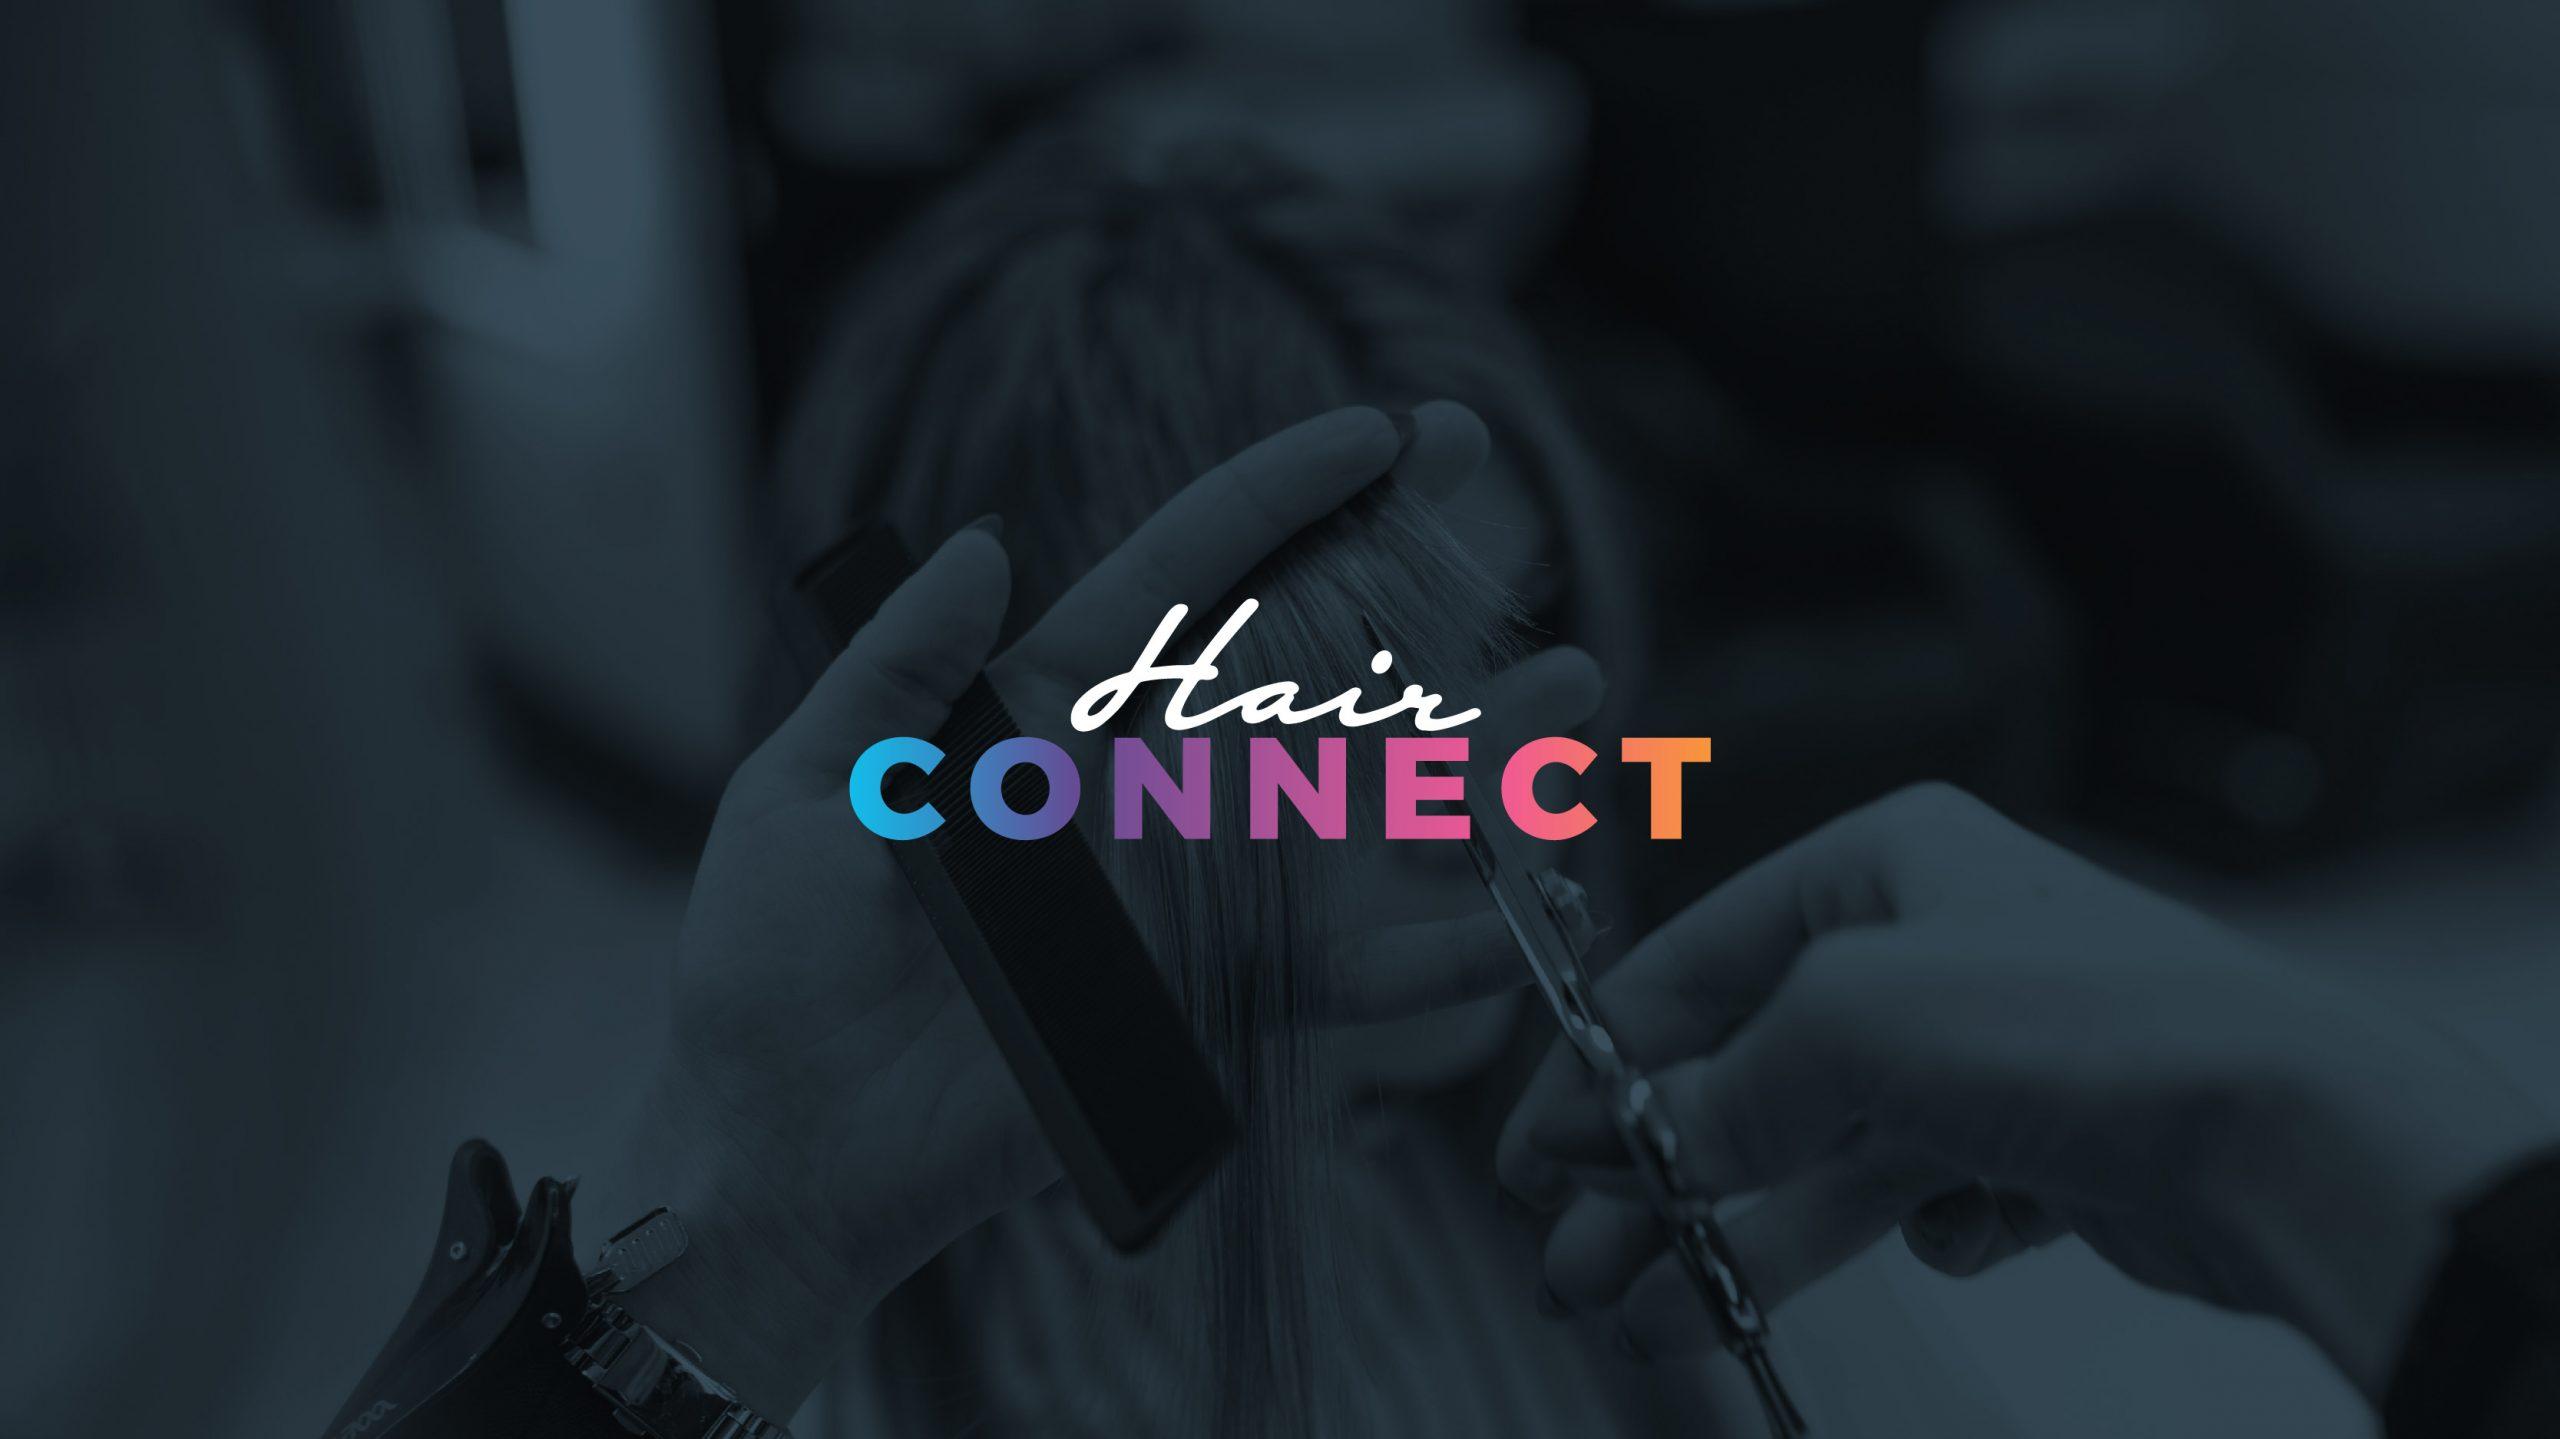 Hair Connect